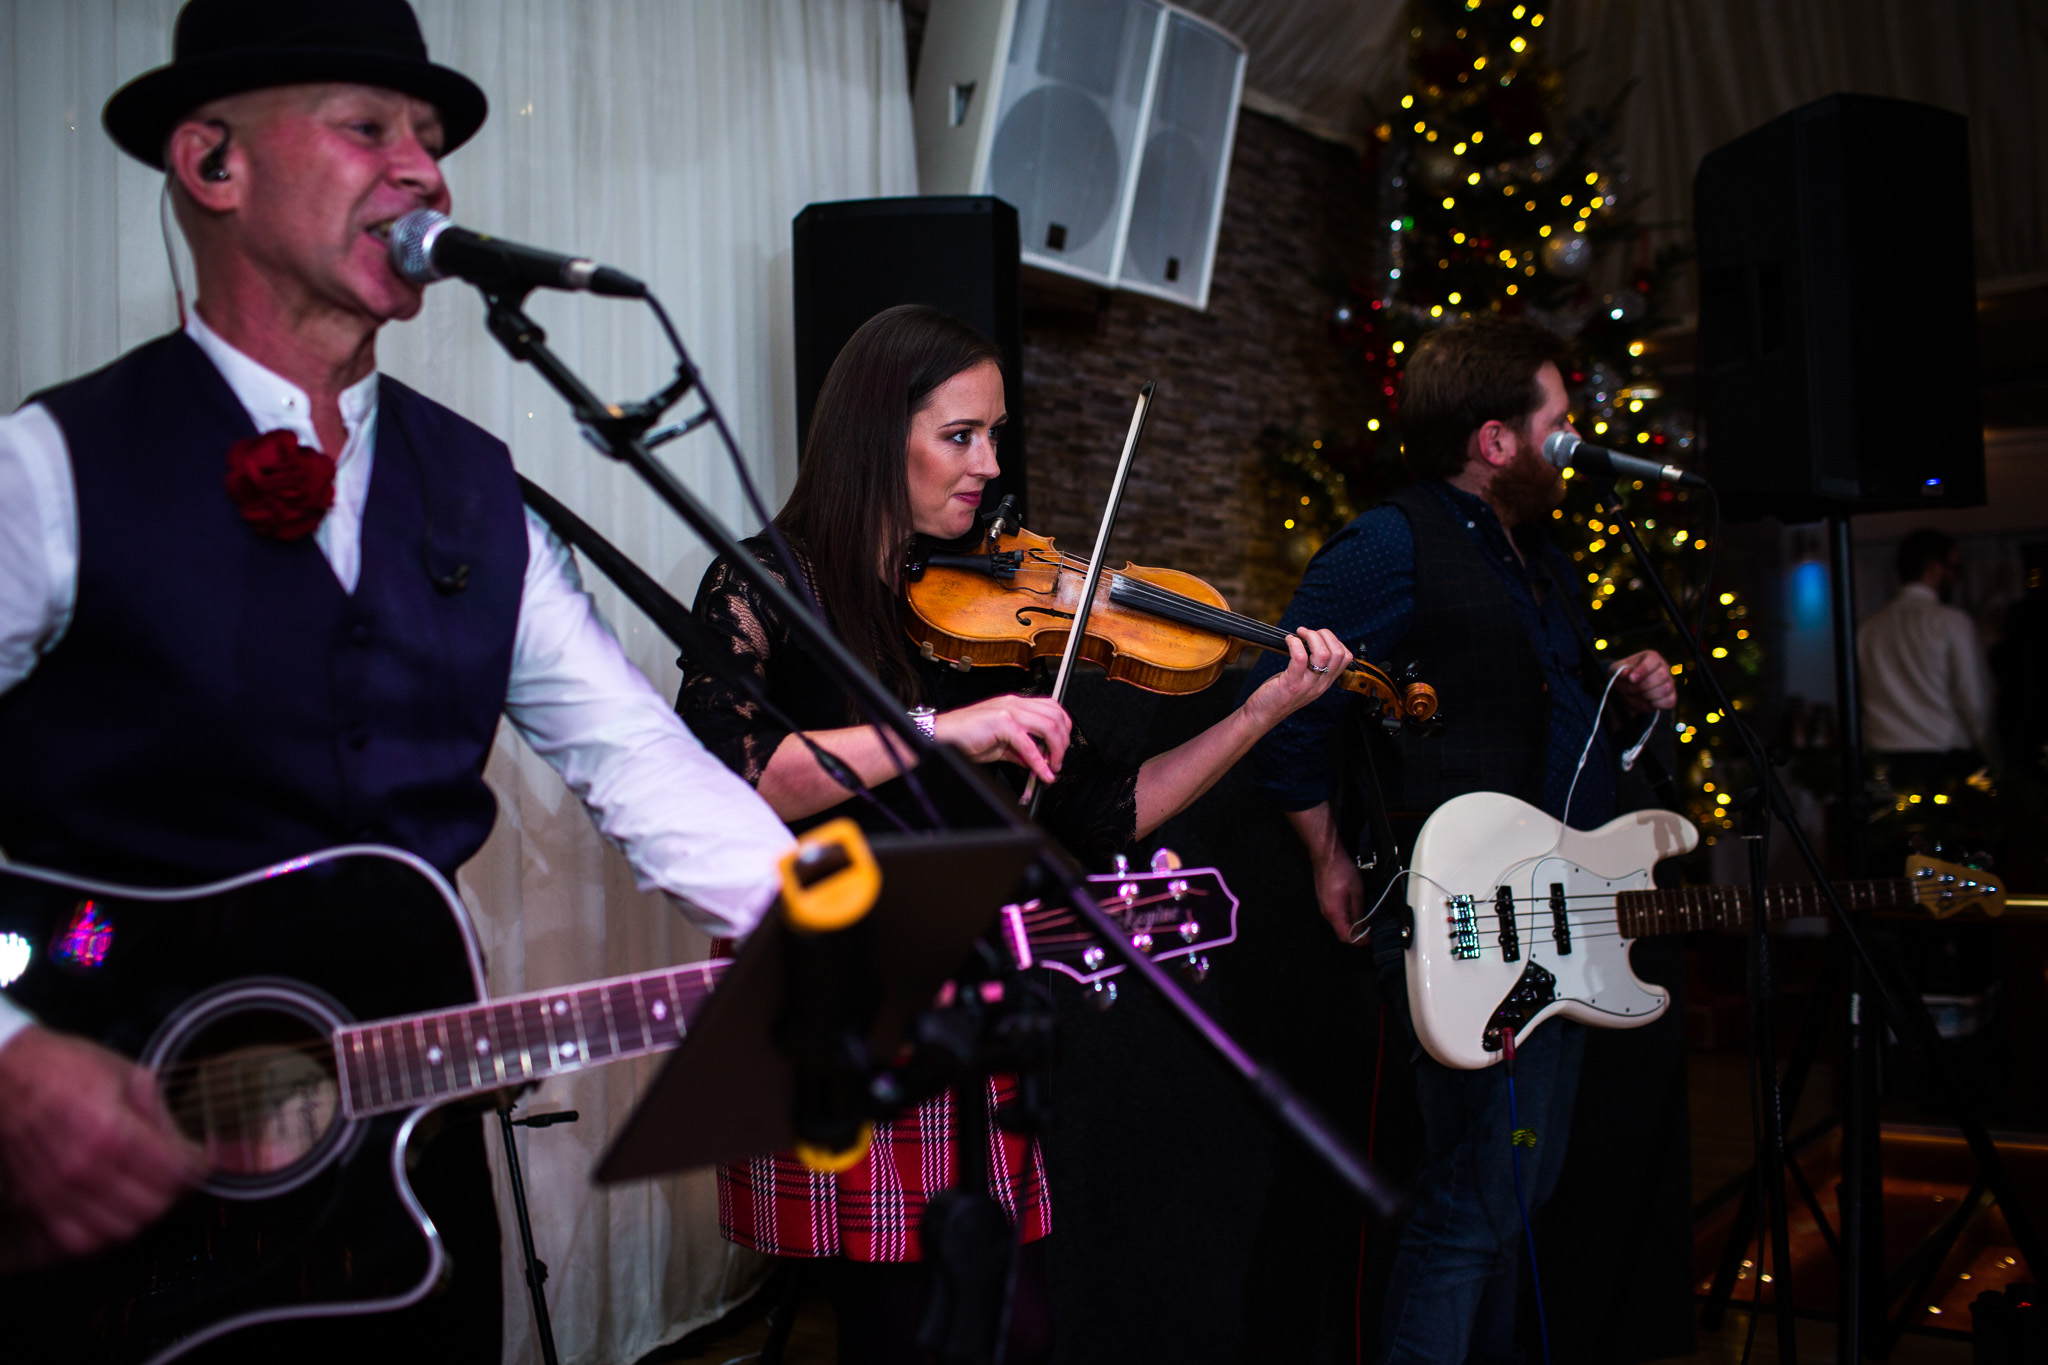 Mark_Barnes_Northern_Ireland_wedding_photographer_Harveys_Point_Donegall_Wedding_photography-Adam&Gemma-70.jpg